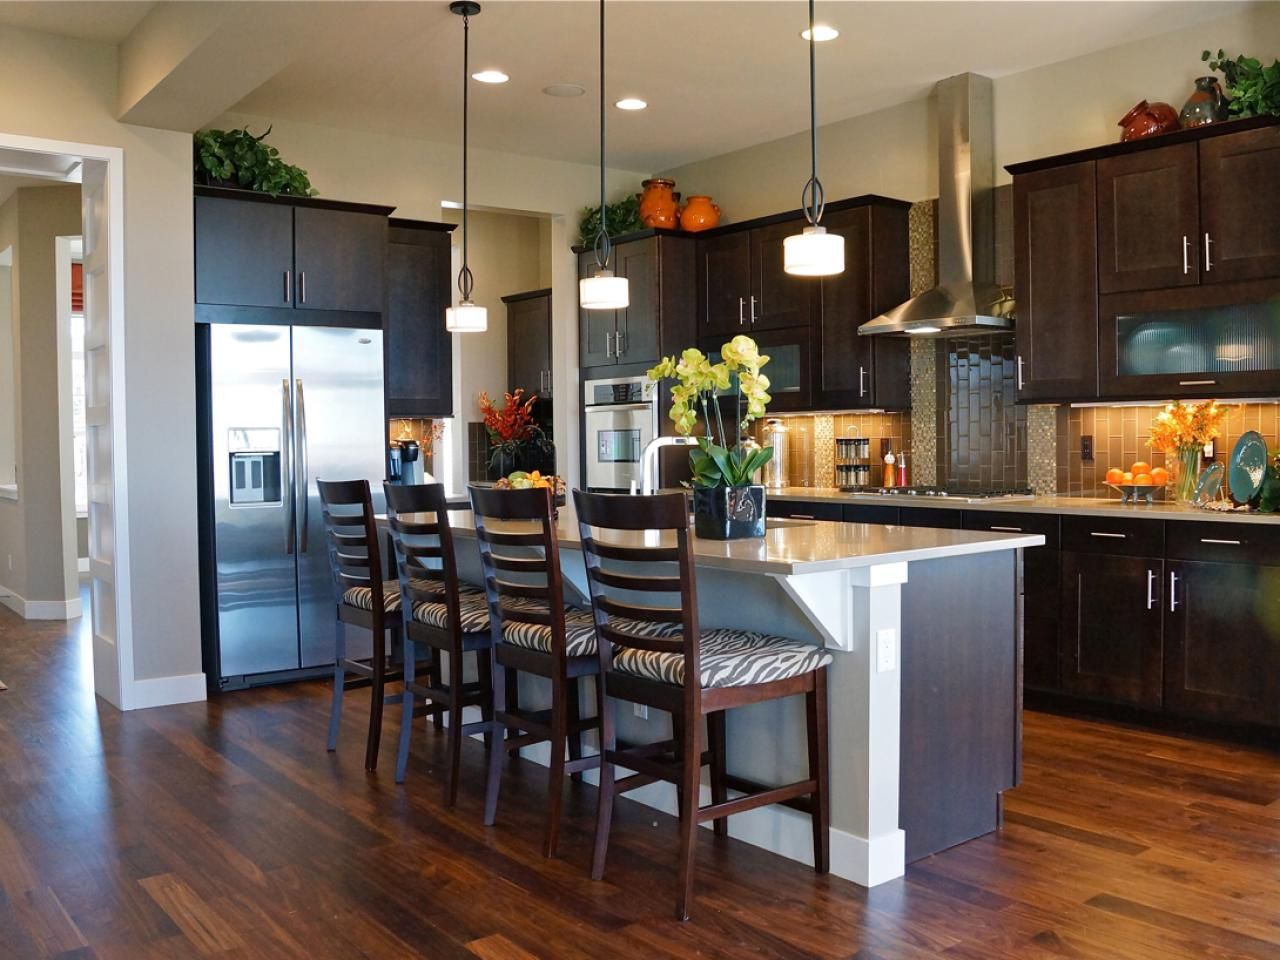 beautiful pictures of kitchen islands hgtv s favorite design ideas breakfast bars on kitchen ideas with island id=94602